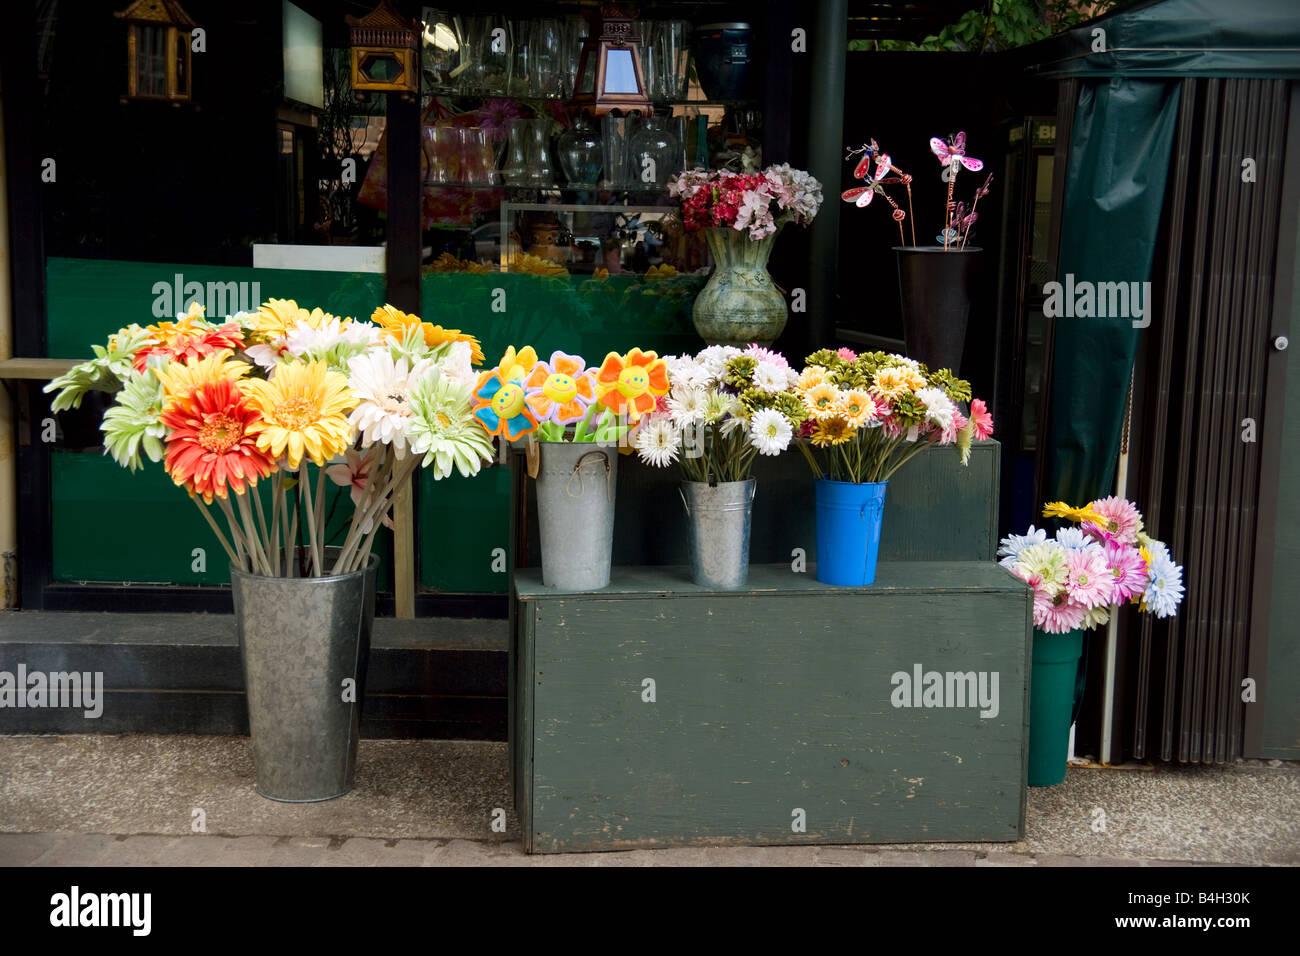 Artificial Flower Stall Stock Photos Artificial Flower Stall Stock